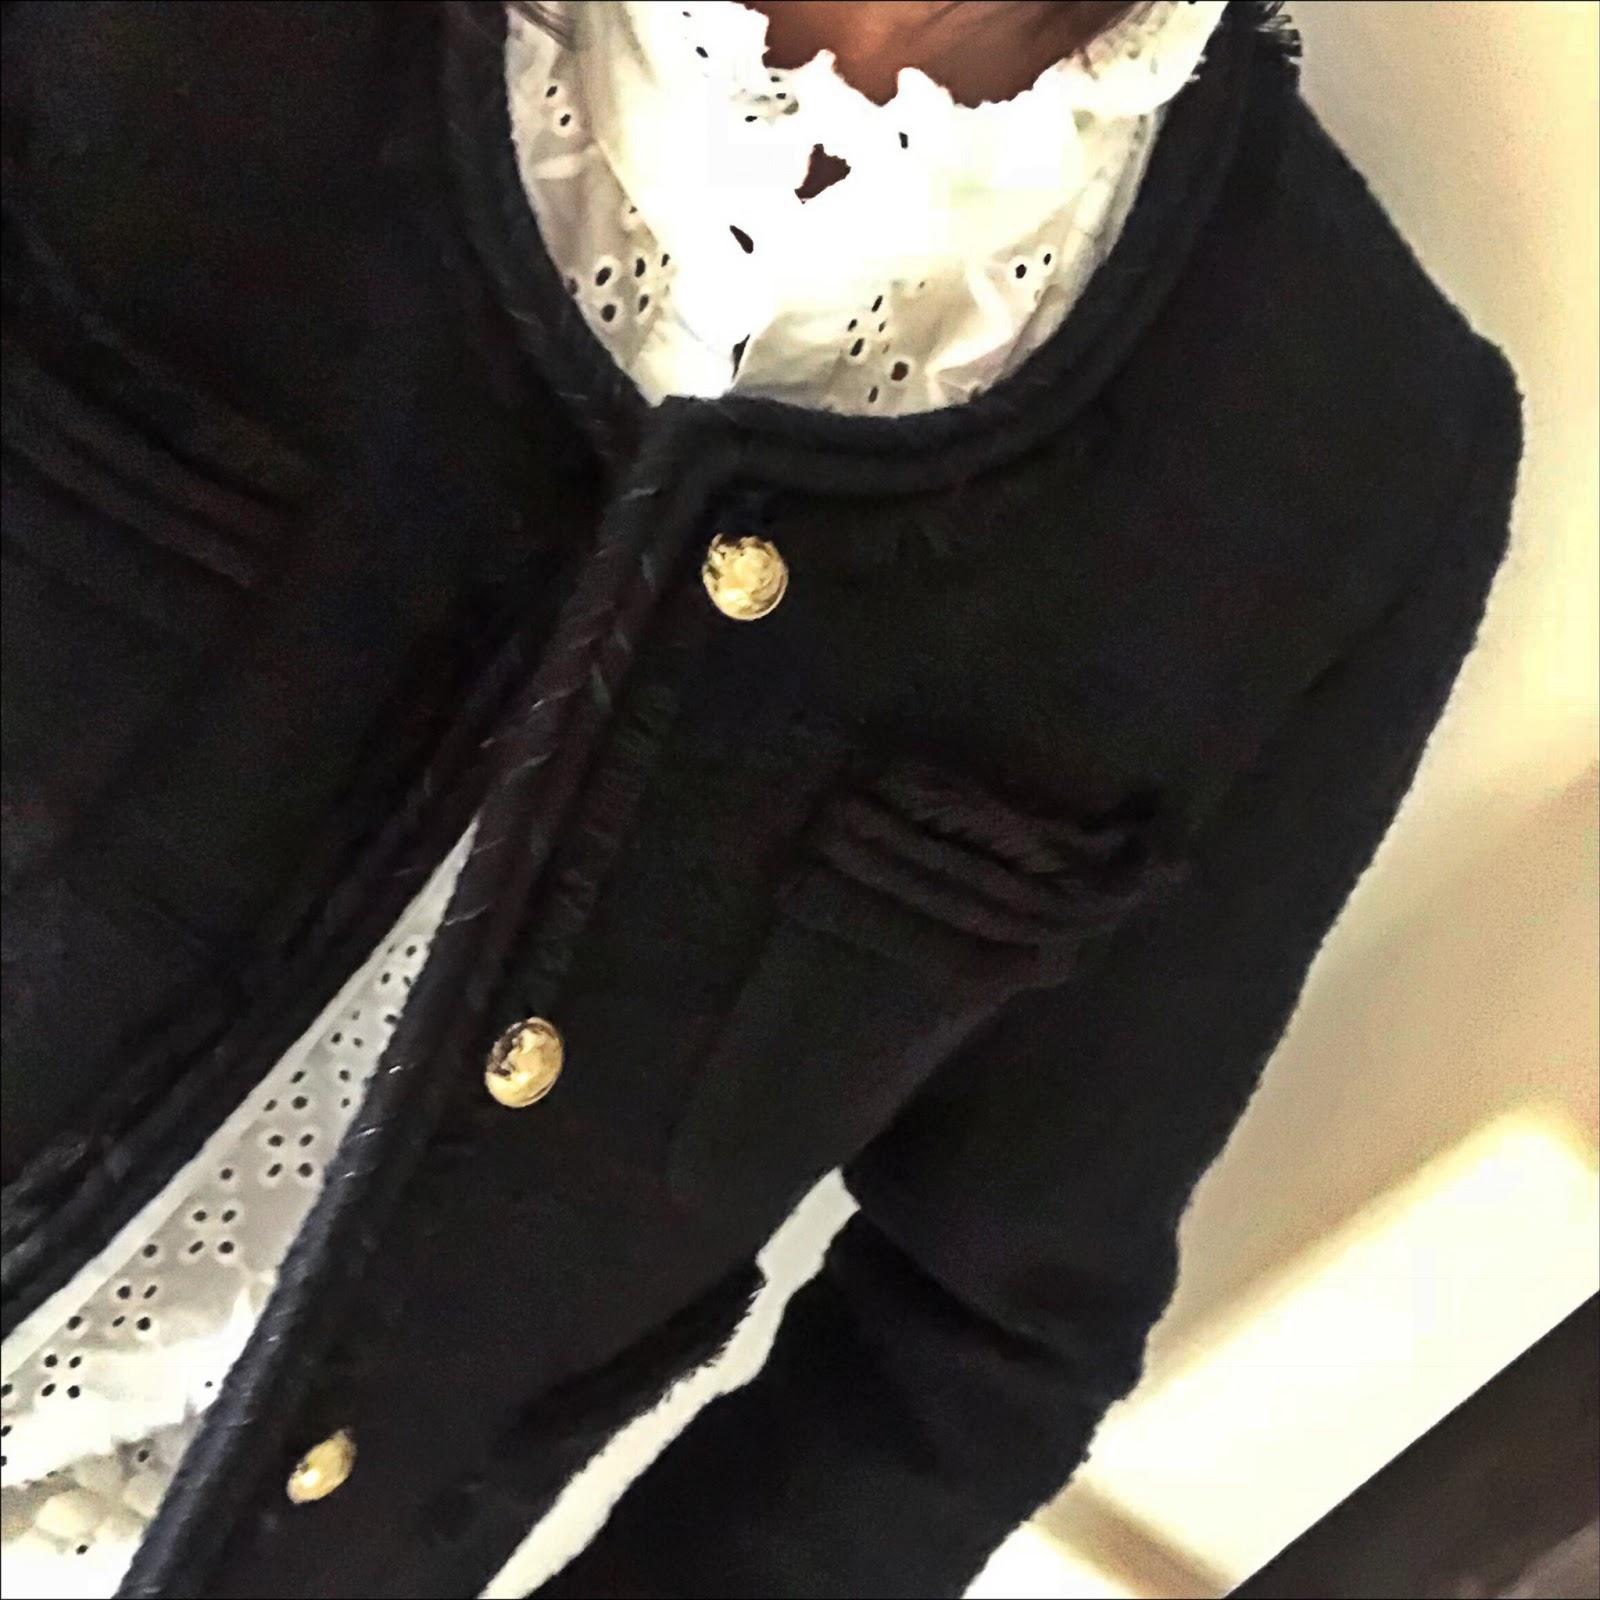 my midlife fashion, j crew tweed lady jacket, zara embroidered blouse